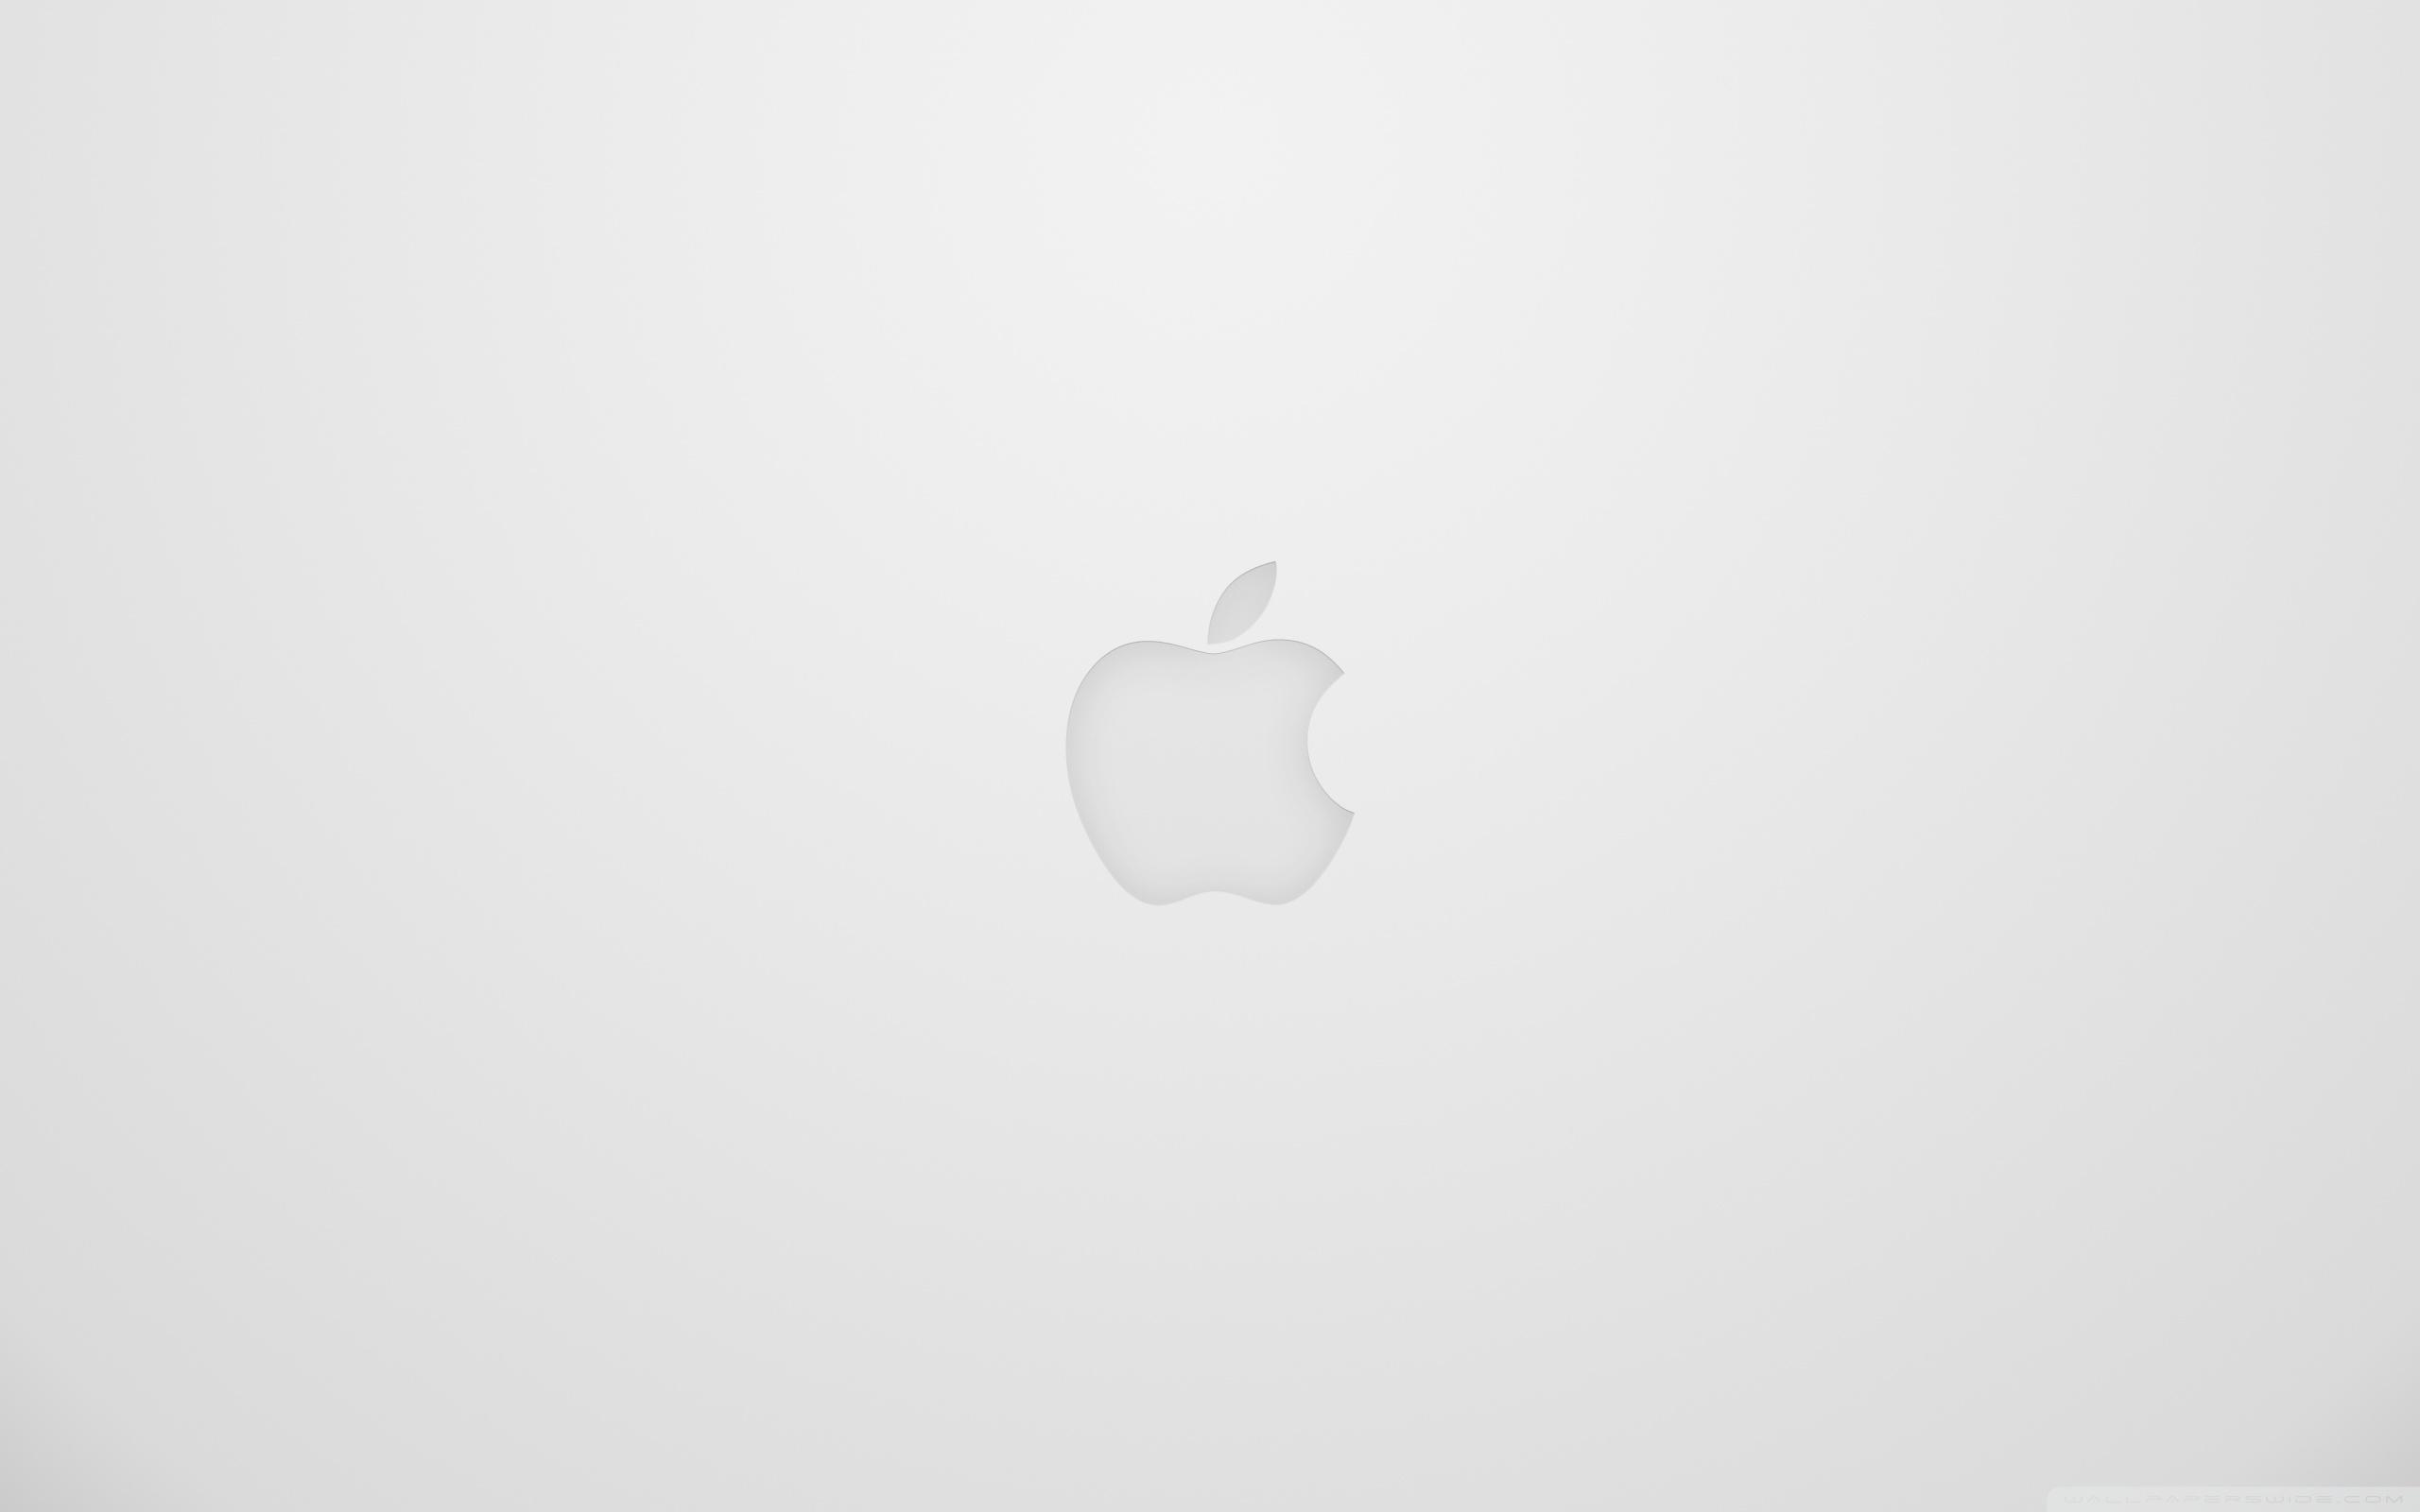 72 Apple White Wallpaper On Wallpapersafari